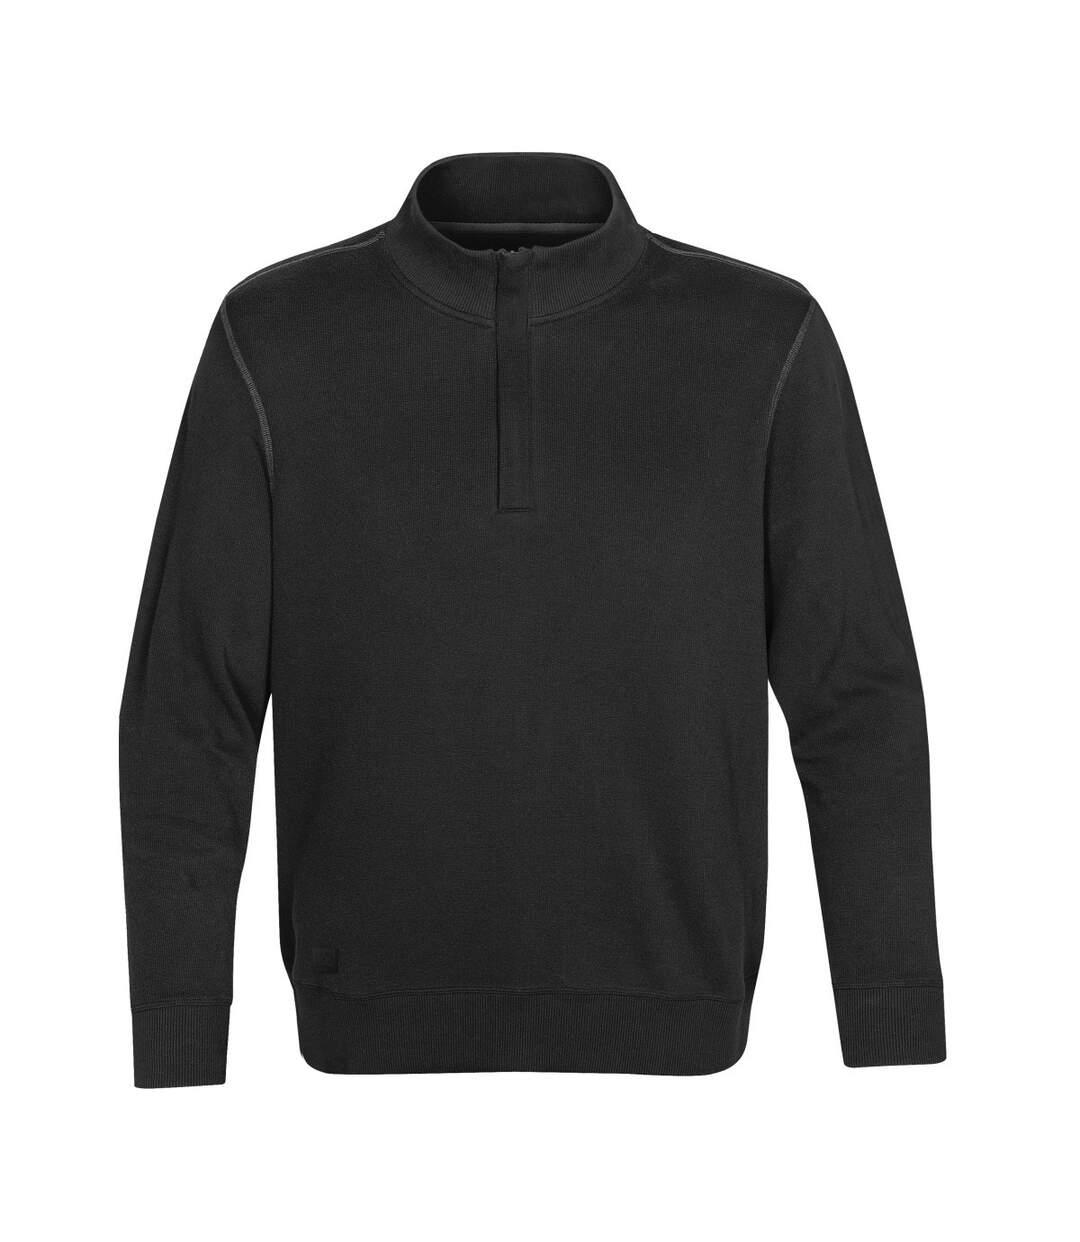 Stormtech Mens Hanford 1/4 Zip Mock Neck Jumper/Sweatshirt (Black/Charcoal) - UTBC3069